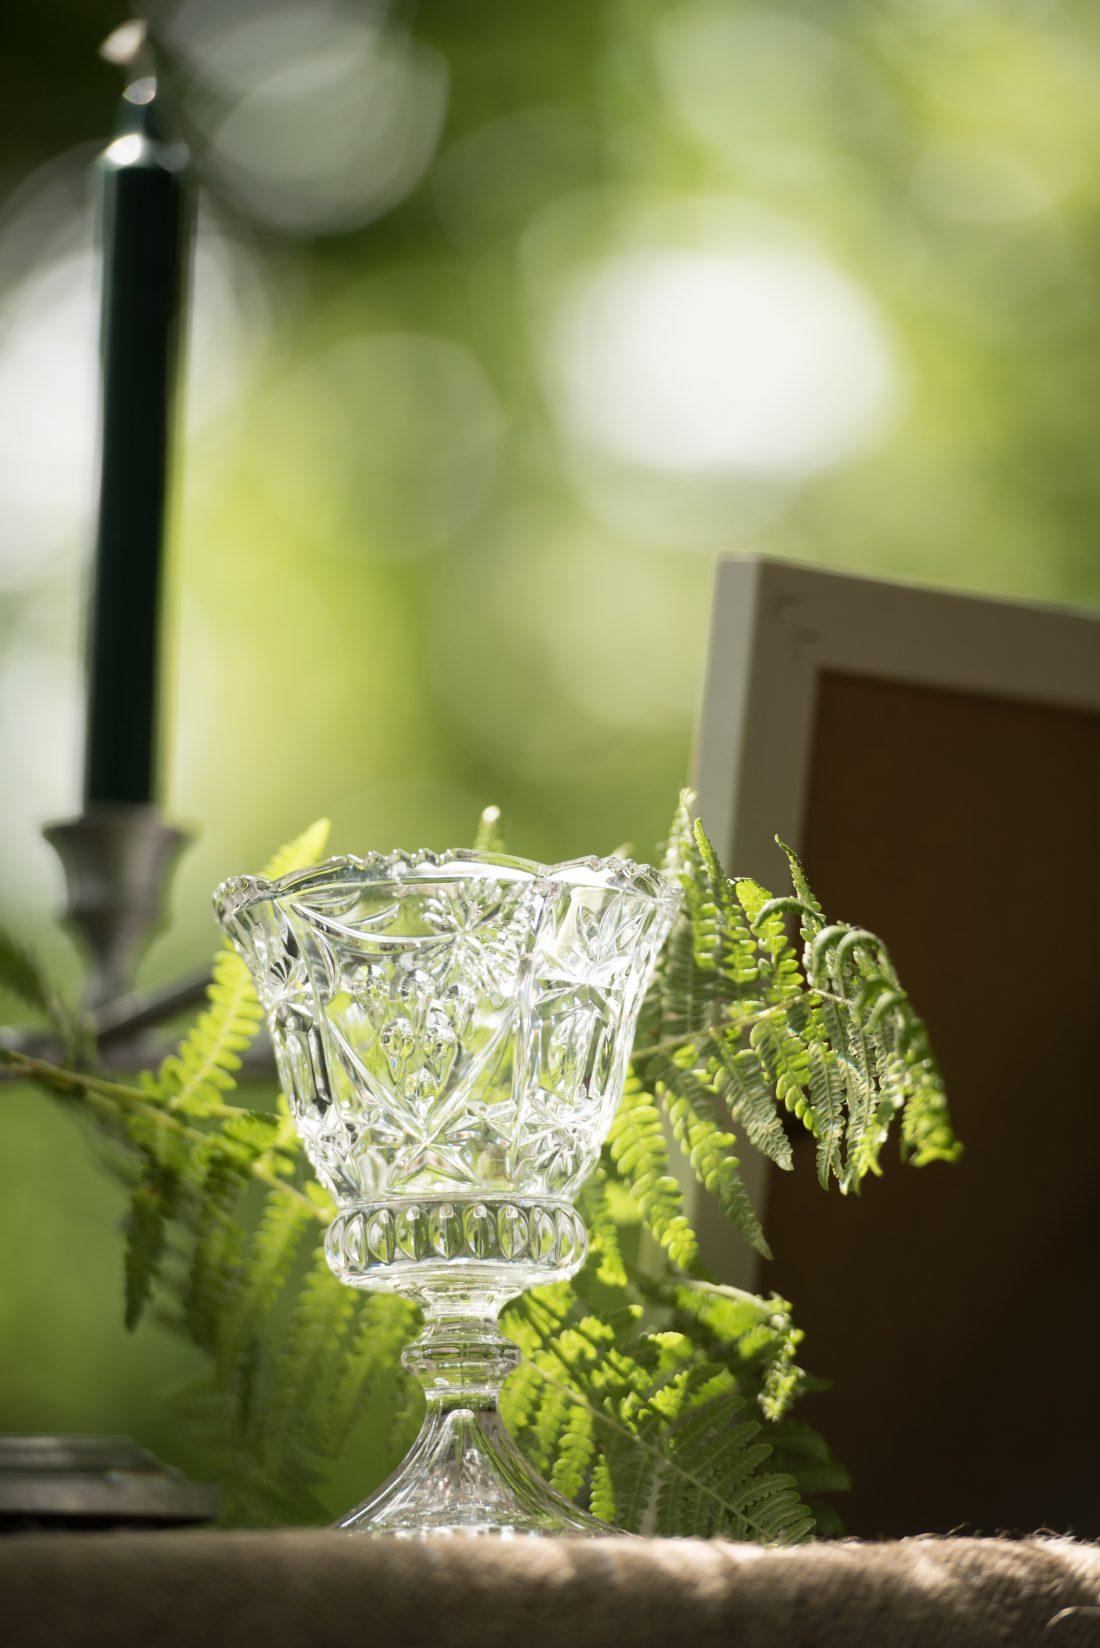 Detail tijdens traditionele handfasting - glas voor mede